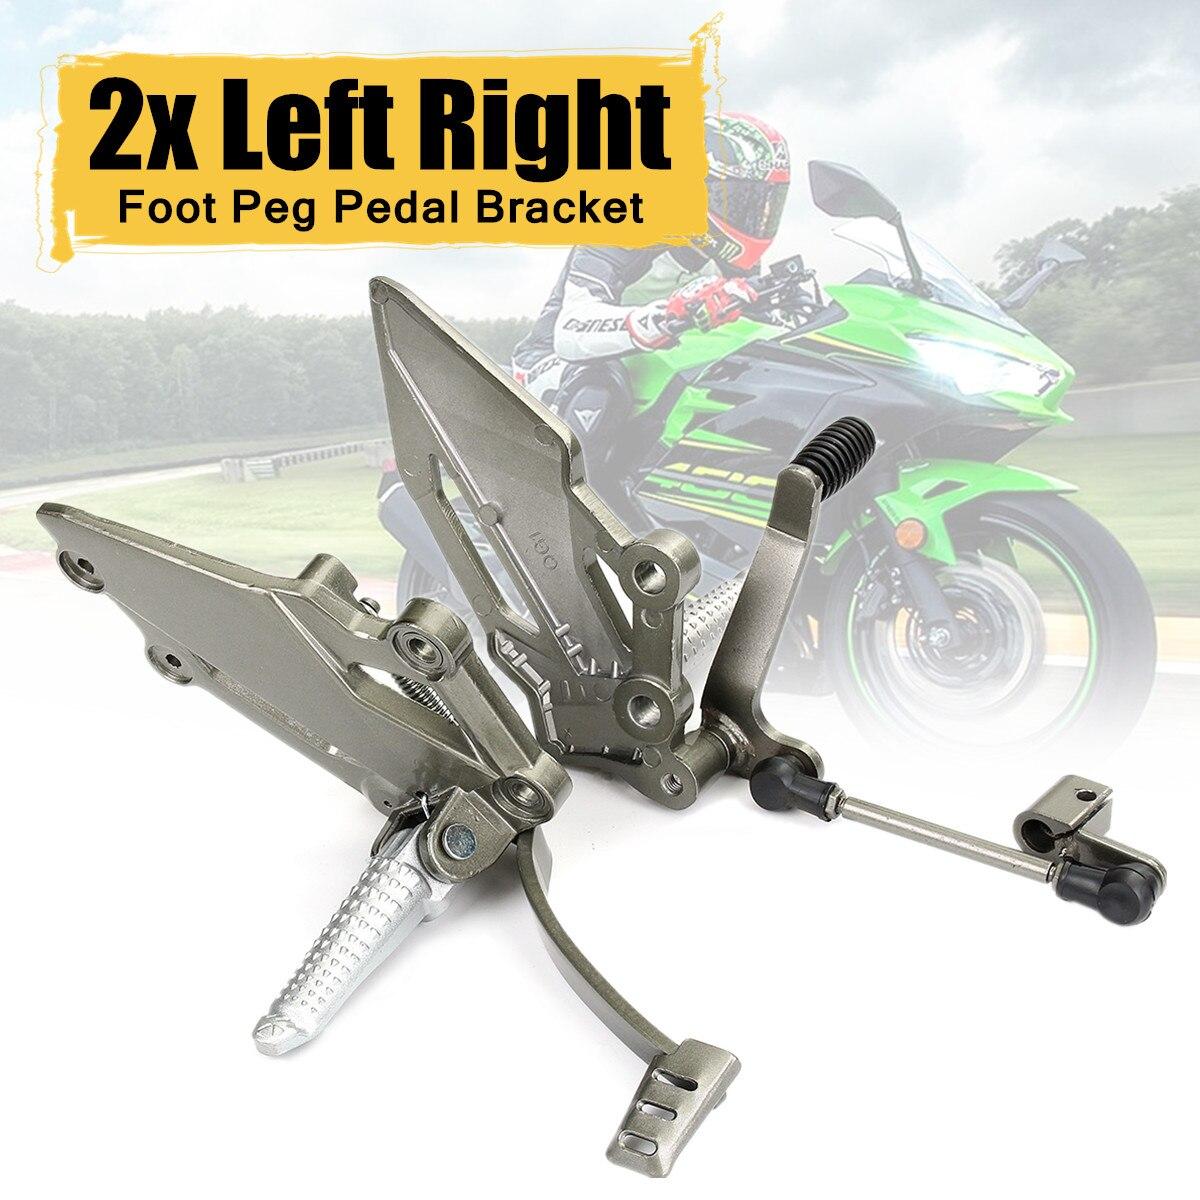 цена на 2x for Kawasaki Ninja 250 Left Right Rear Foot Peg Brake Pedal Footrest Bracket Aluminum Alloy Surface Polishing Galvanized